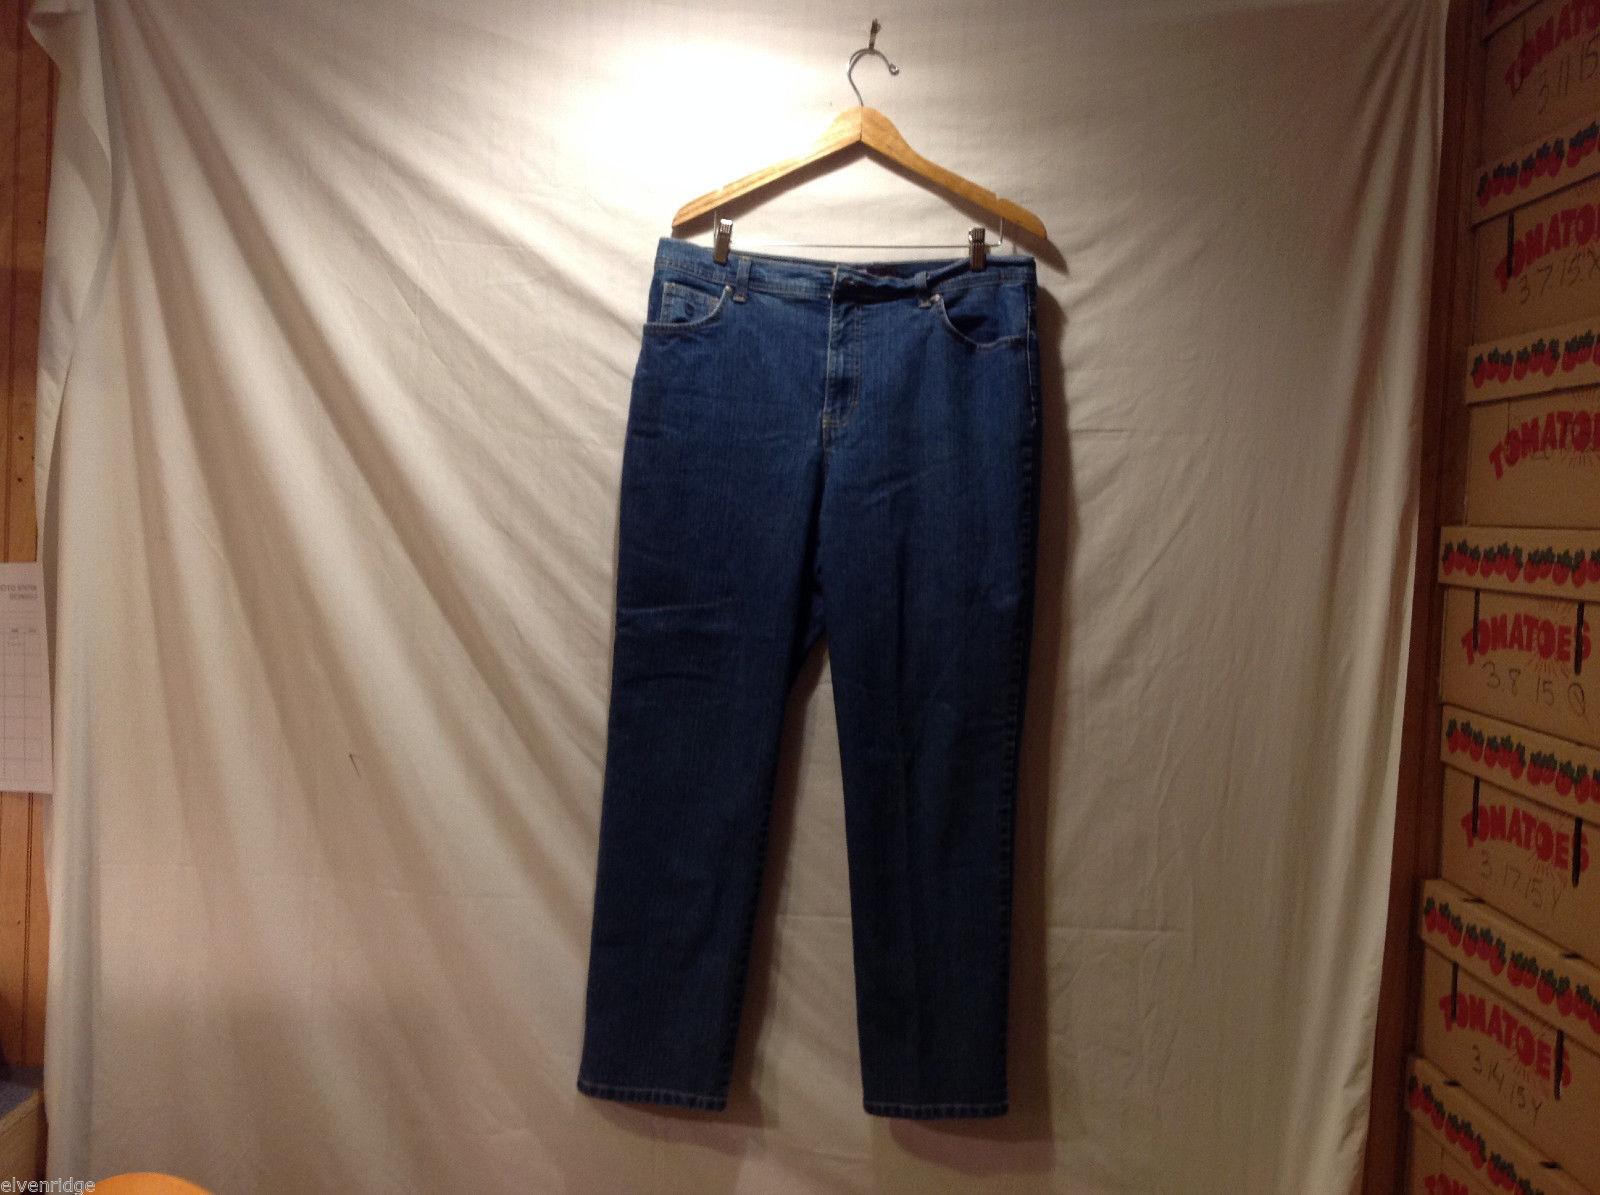 Gloria Vanderbilt Medium Blue Wash Jeans Pants, Size 16 Great condition